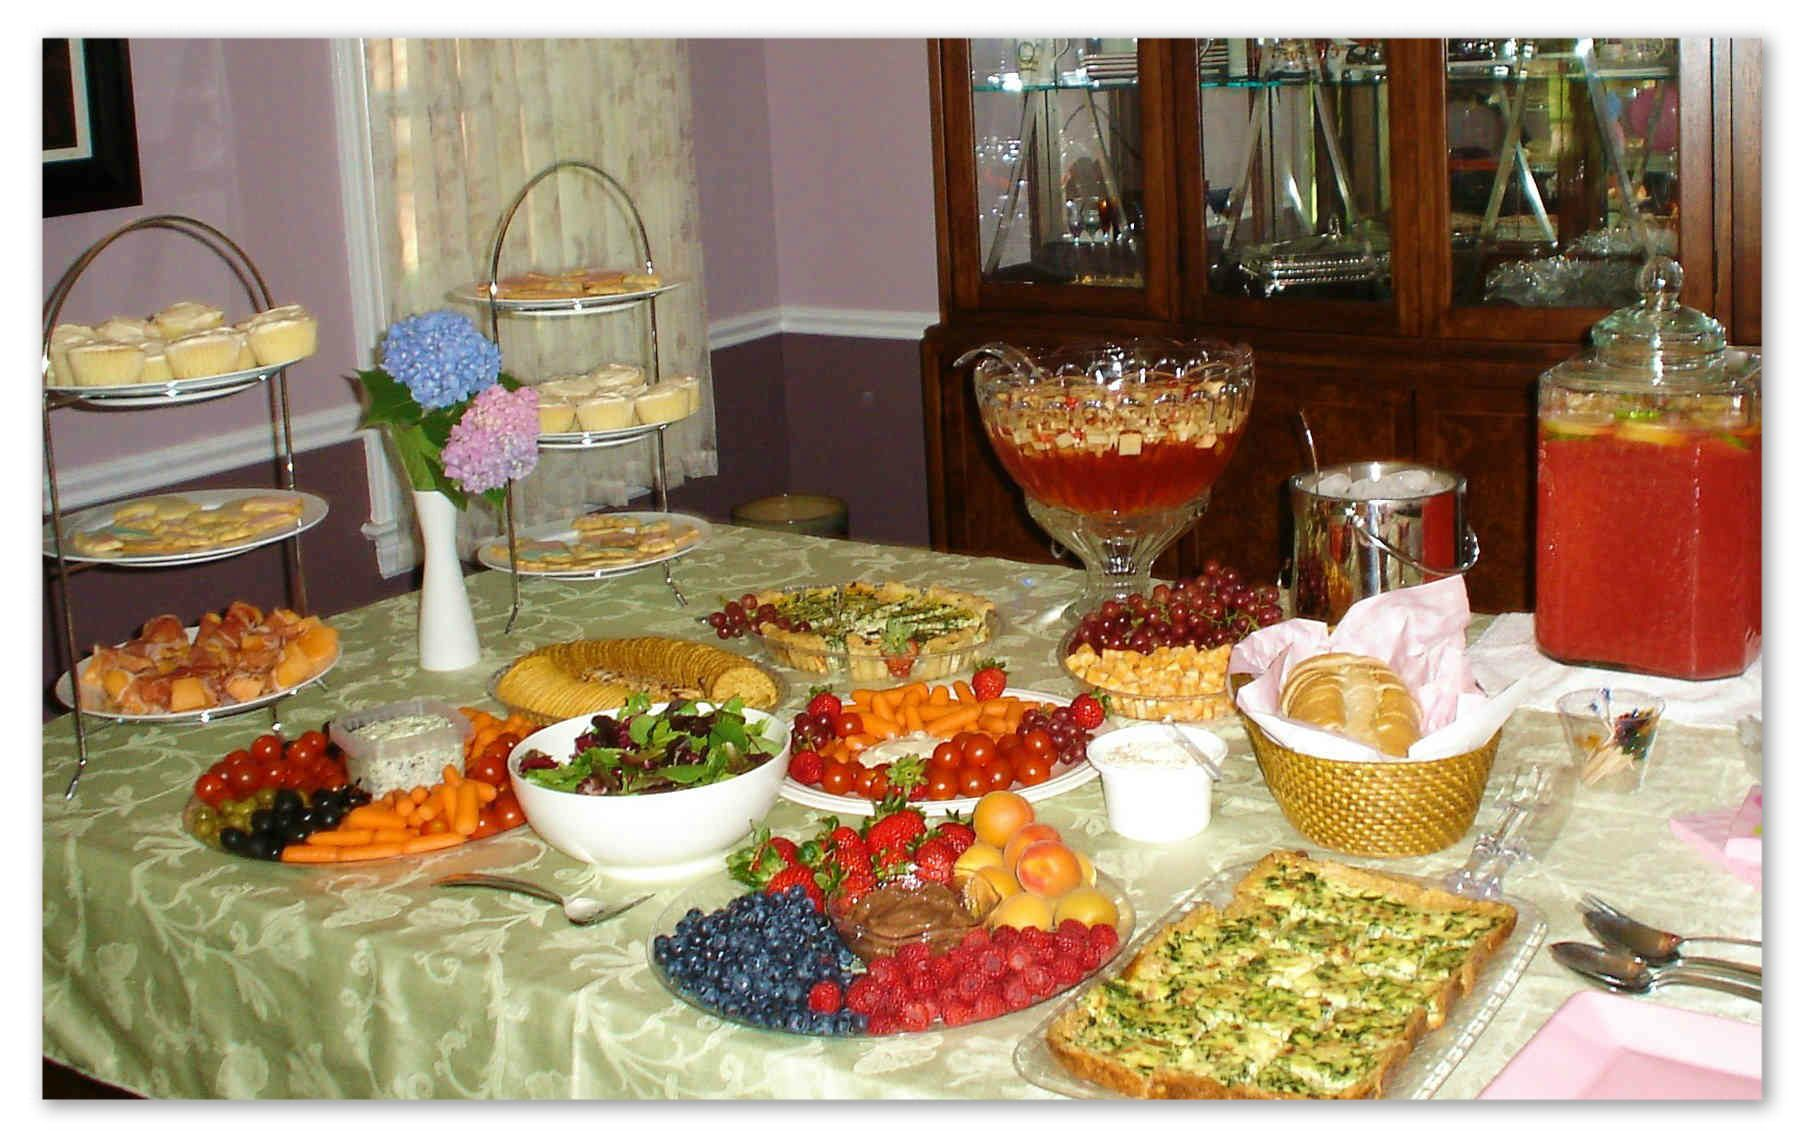 Food Festive BrunchPerfect for Motheru0027s Day Baby